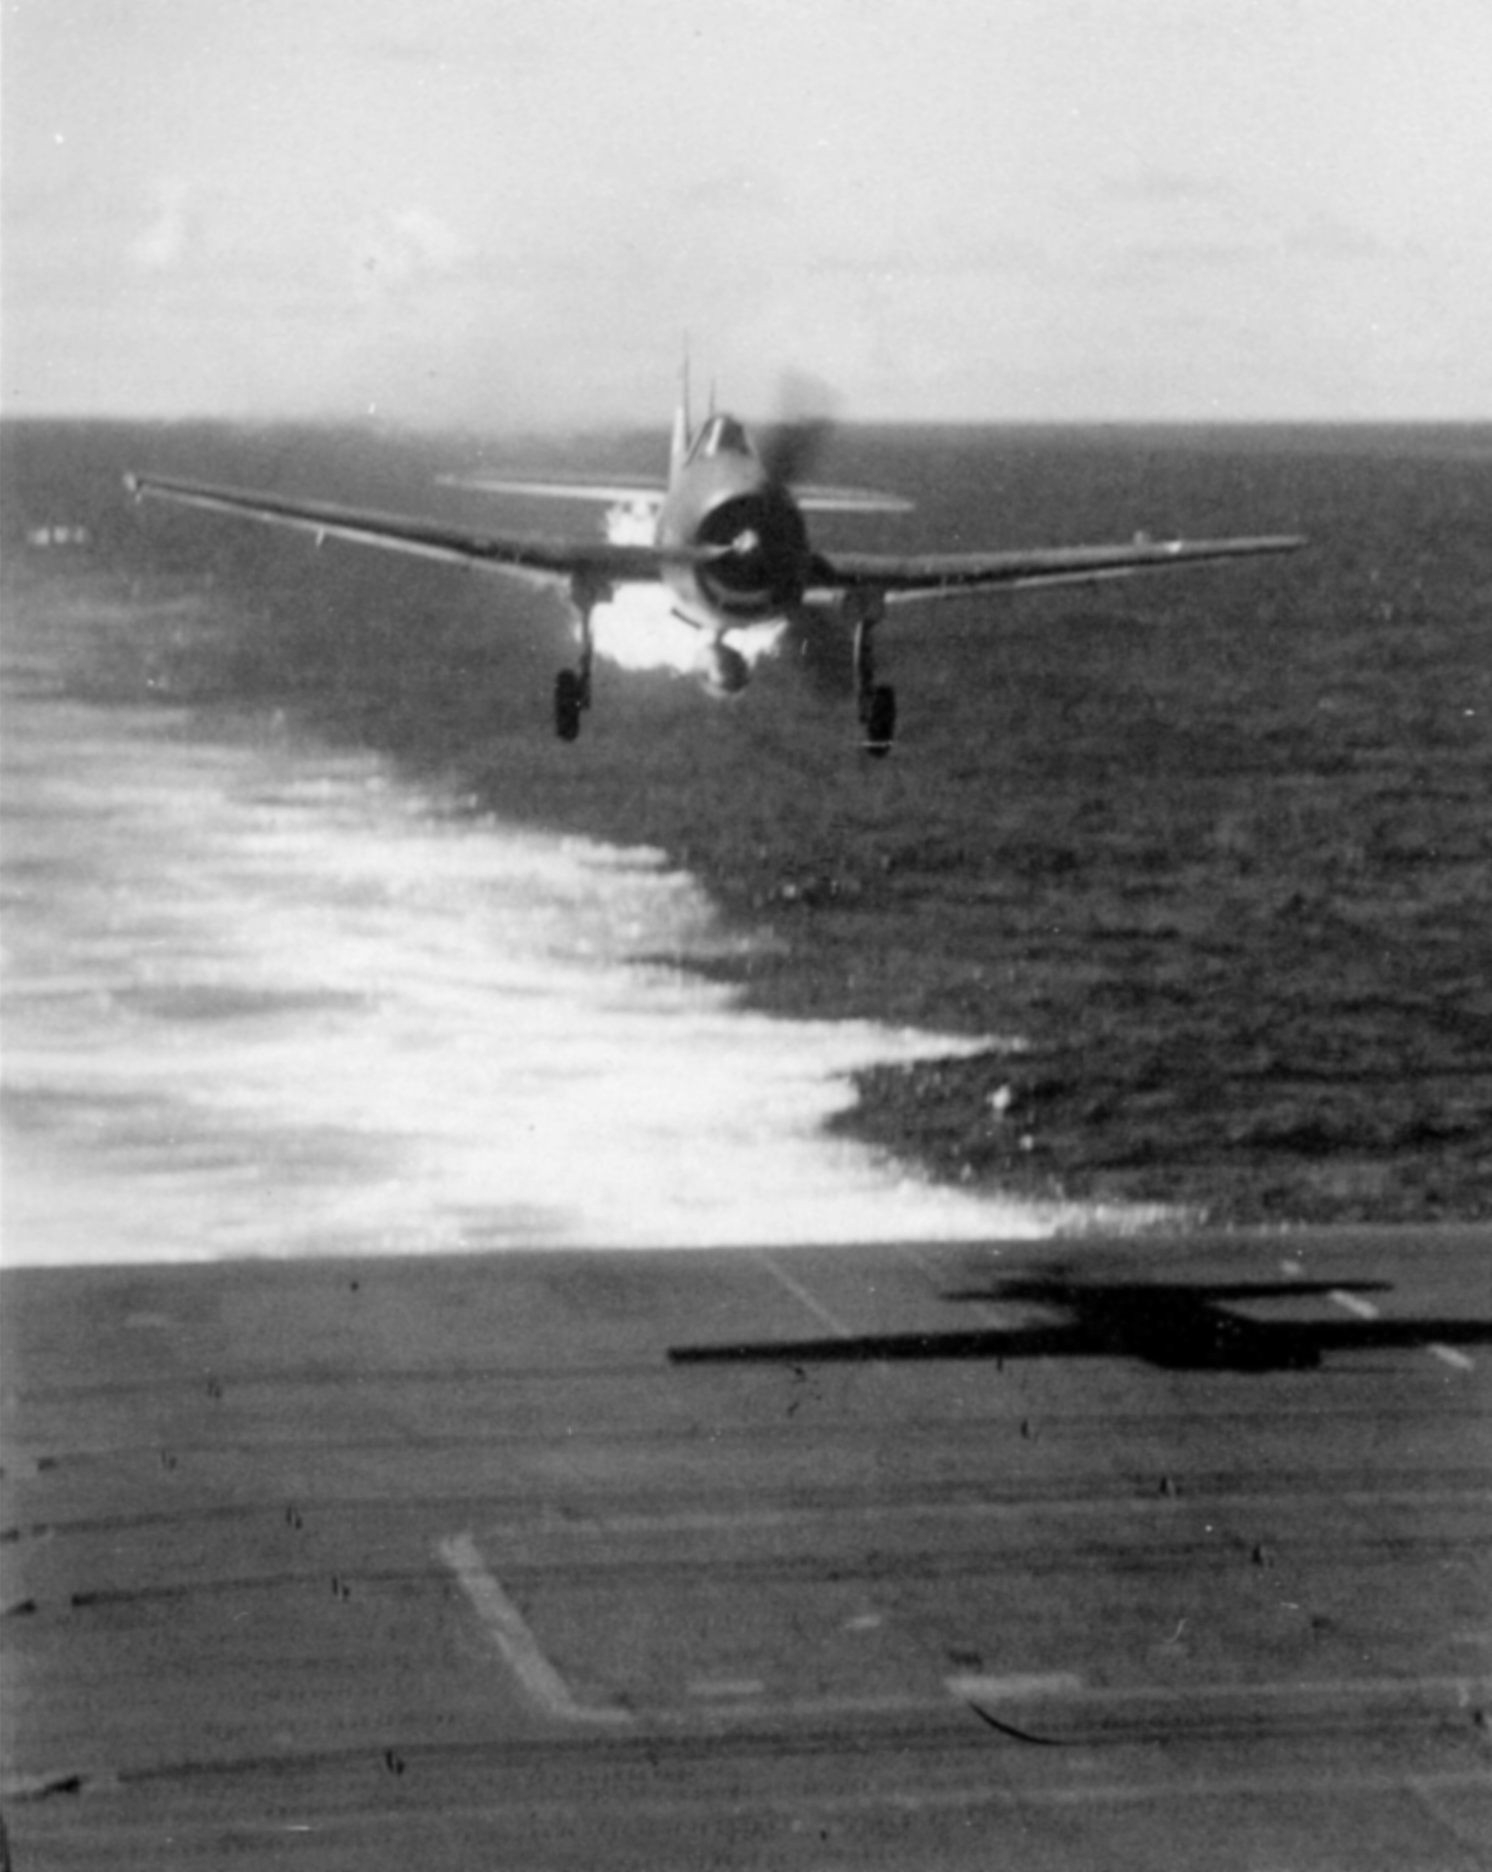 Grumman F6F 3 Hellcat VF 25 White 3 LTJG AW Magee CVL 25 USS Cowpens 20th Nov 1943 02